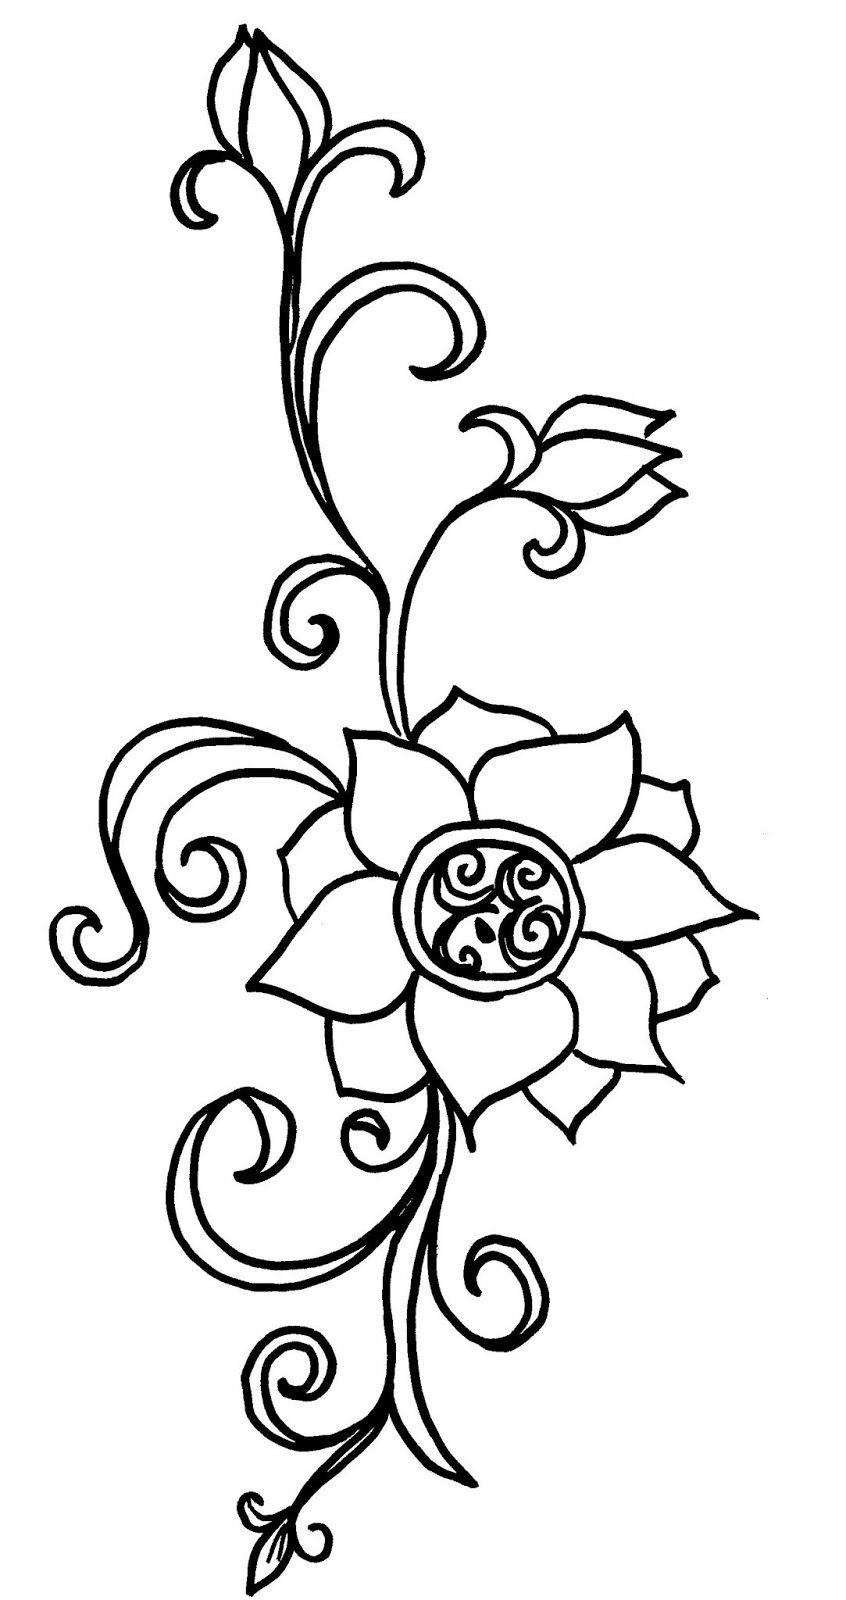 Lotus Flower Drawings For Tattoos Lotus Flower Tattoo Stencils